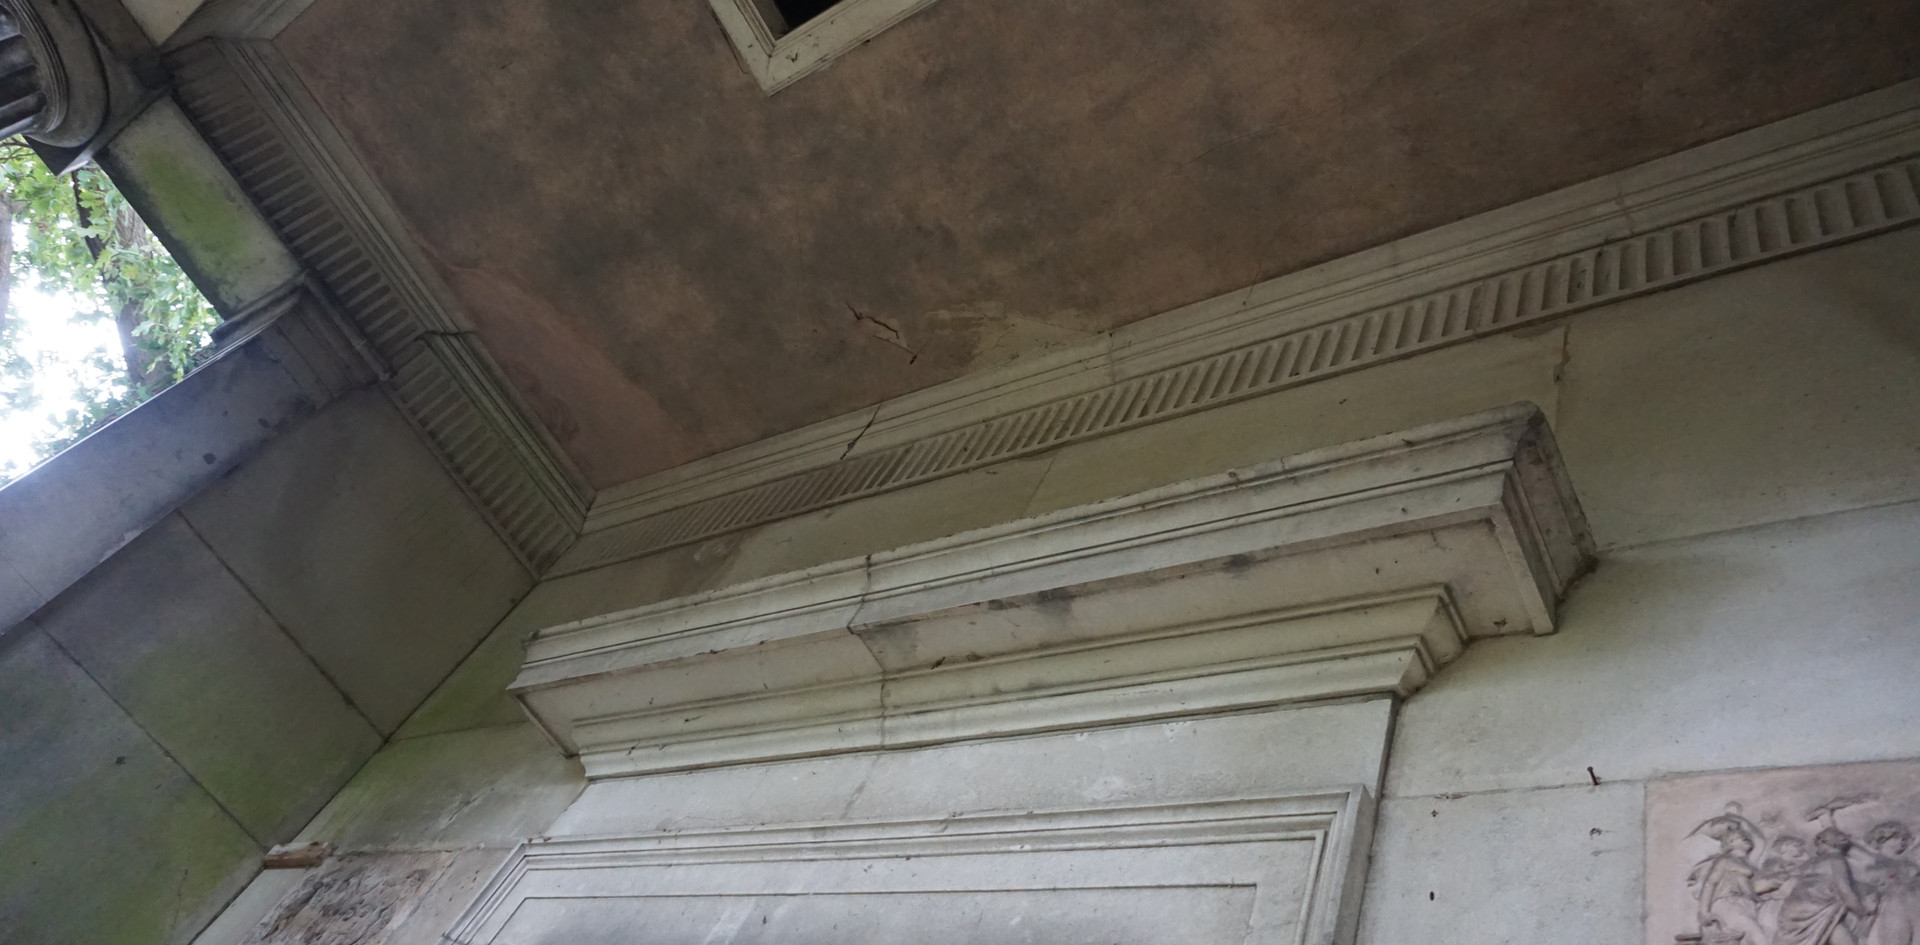 Above entrance